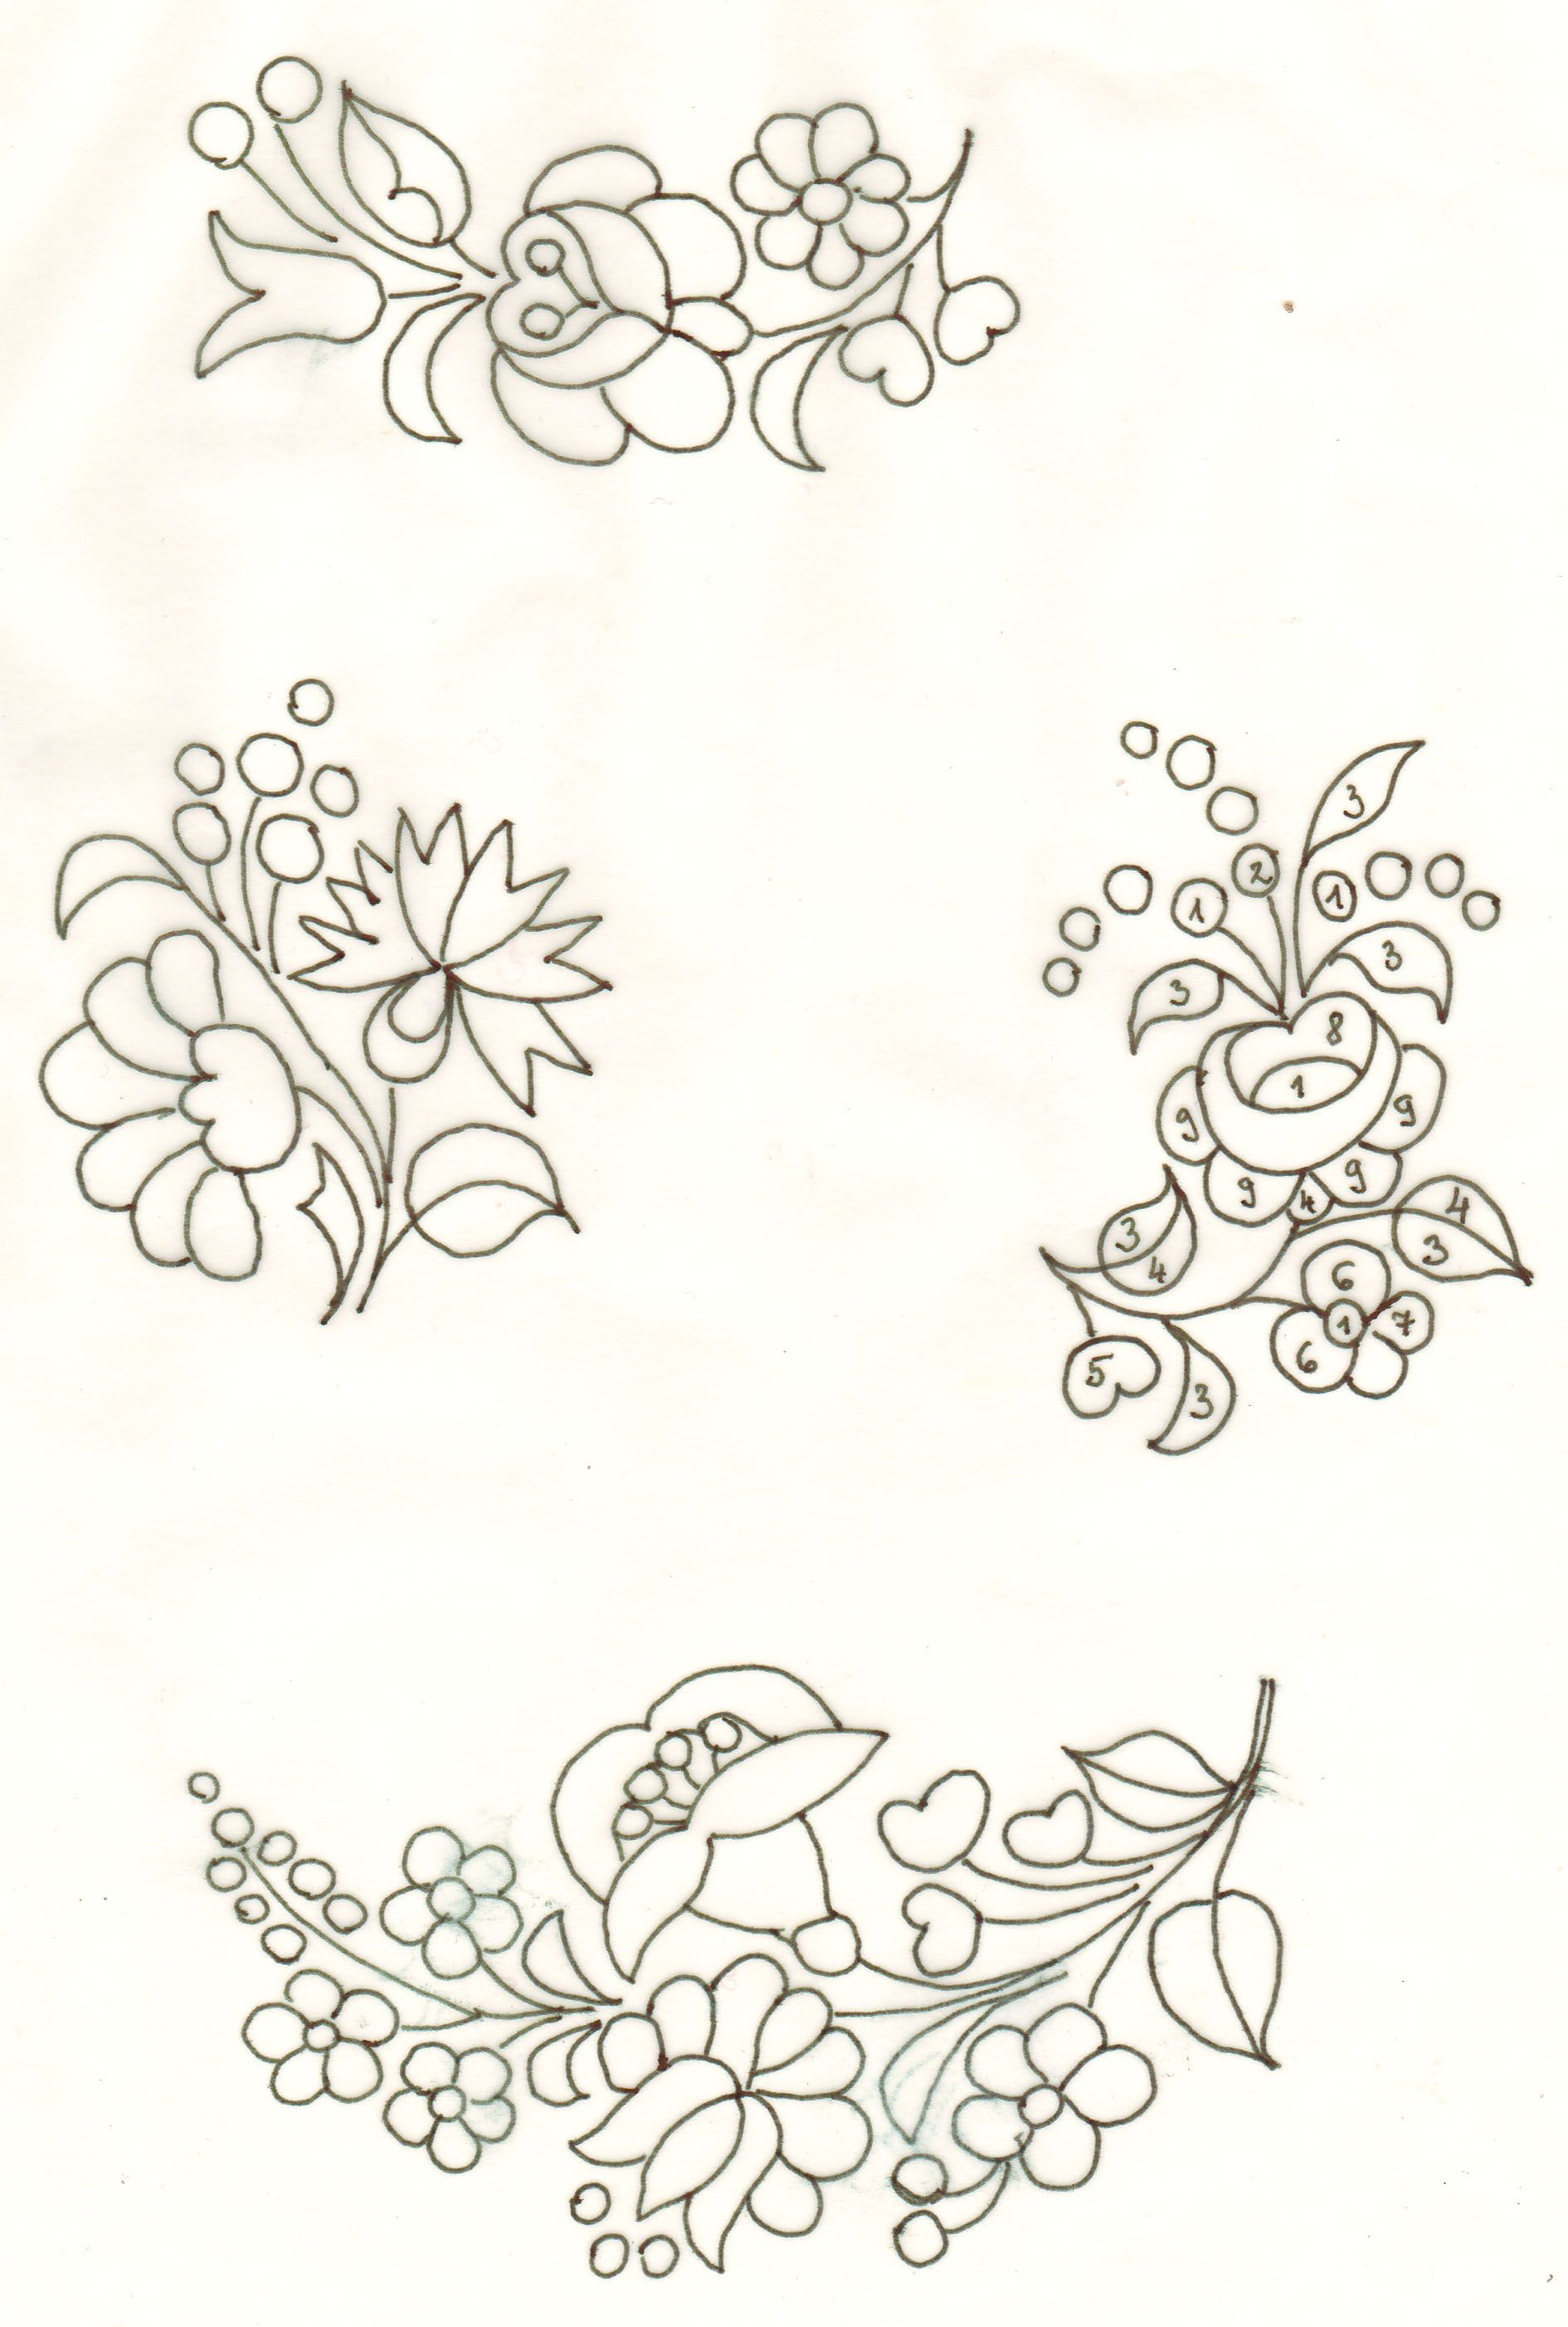 flores húngaras | Flores para porcelana | Bordado, Bordado hardanger ...